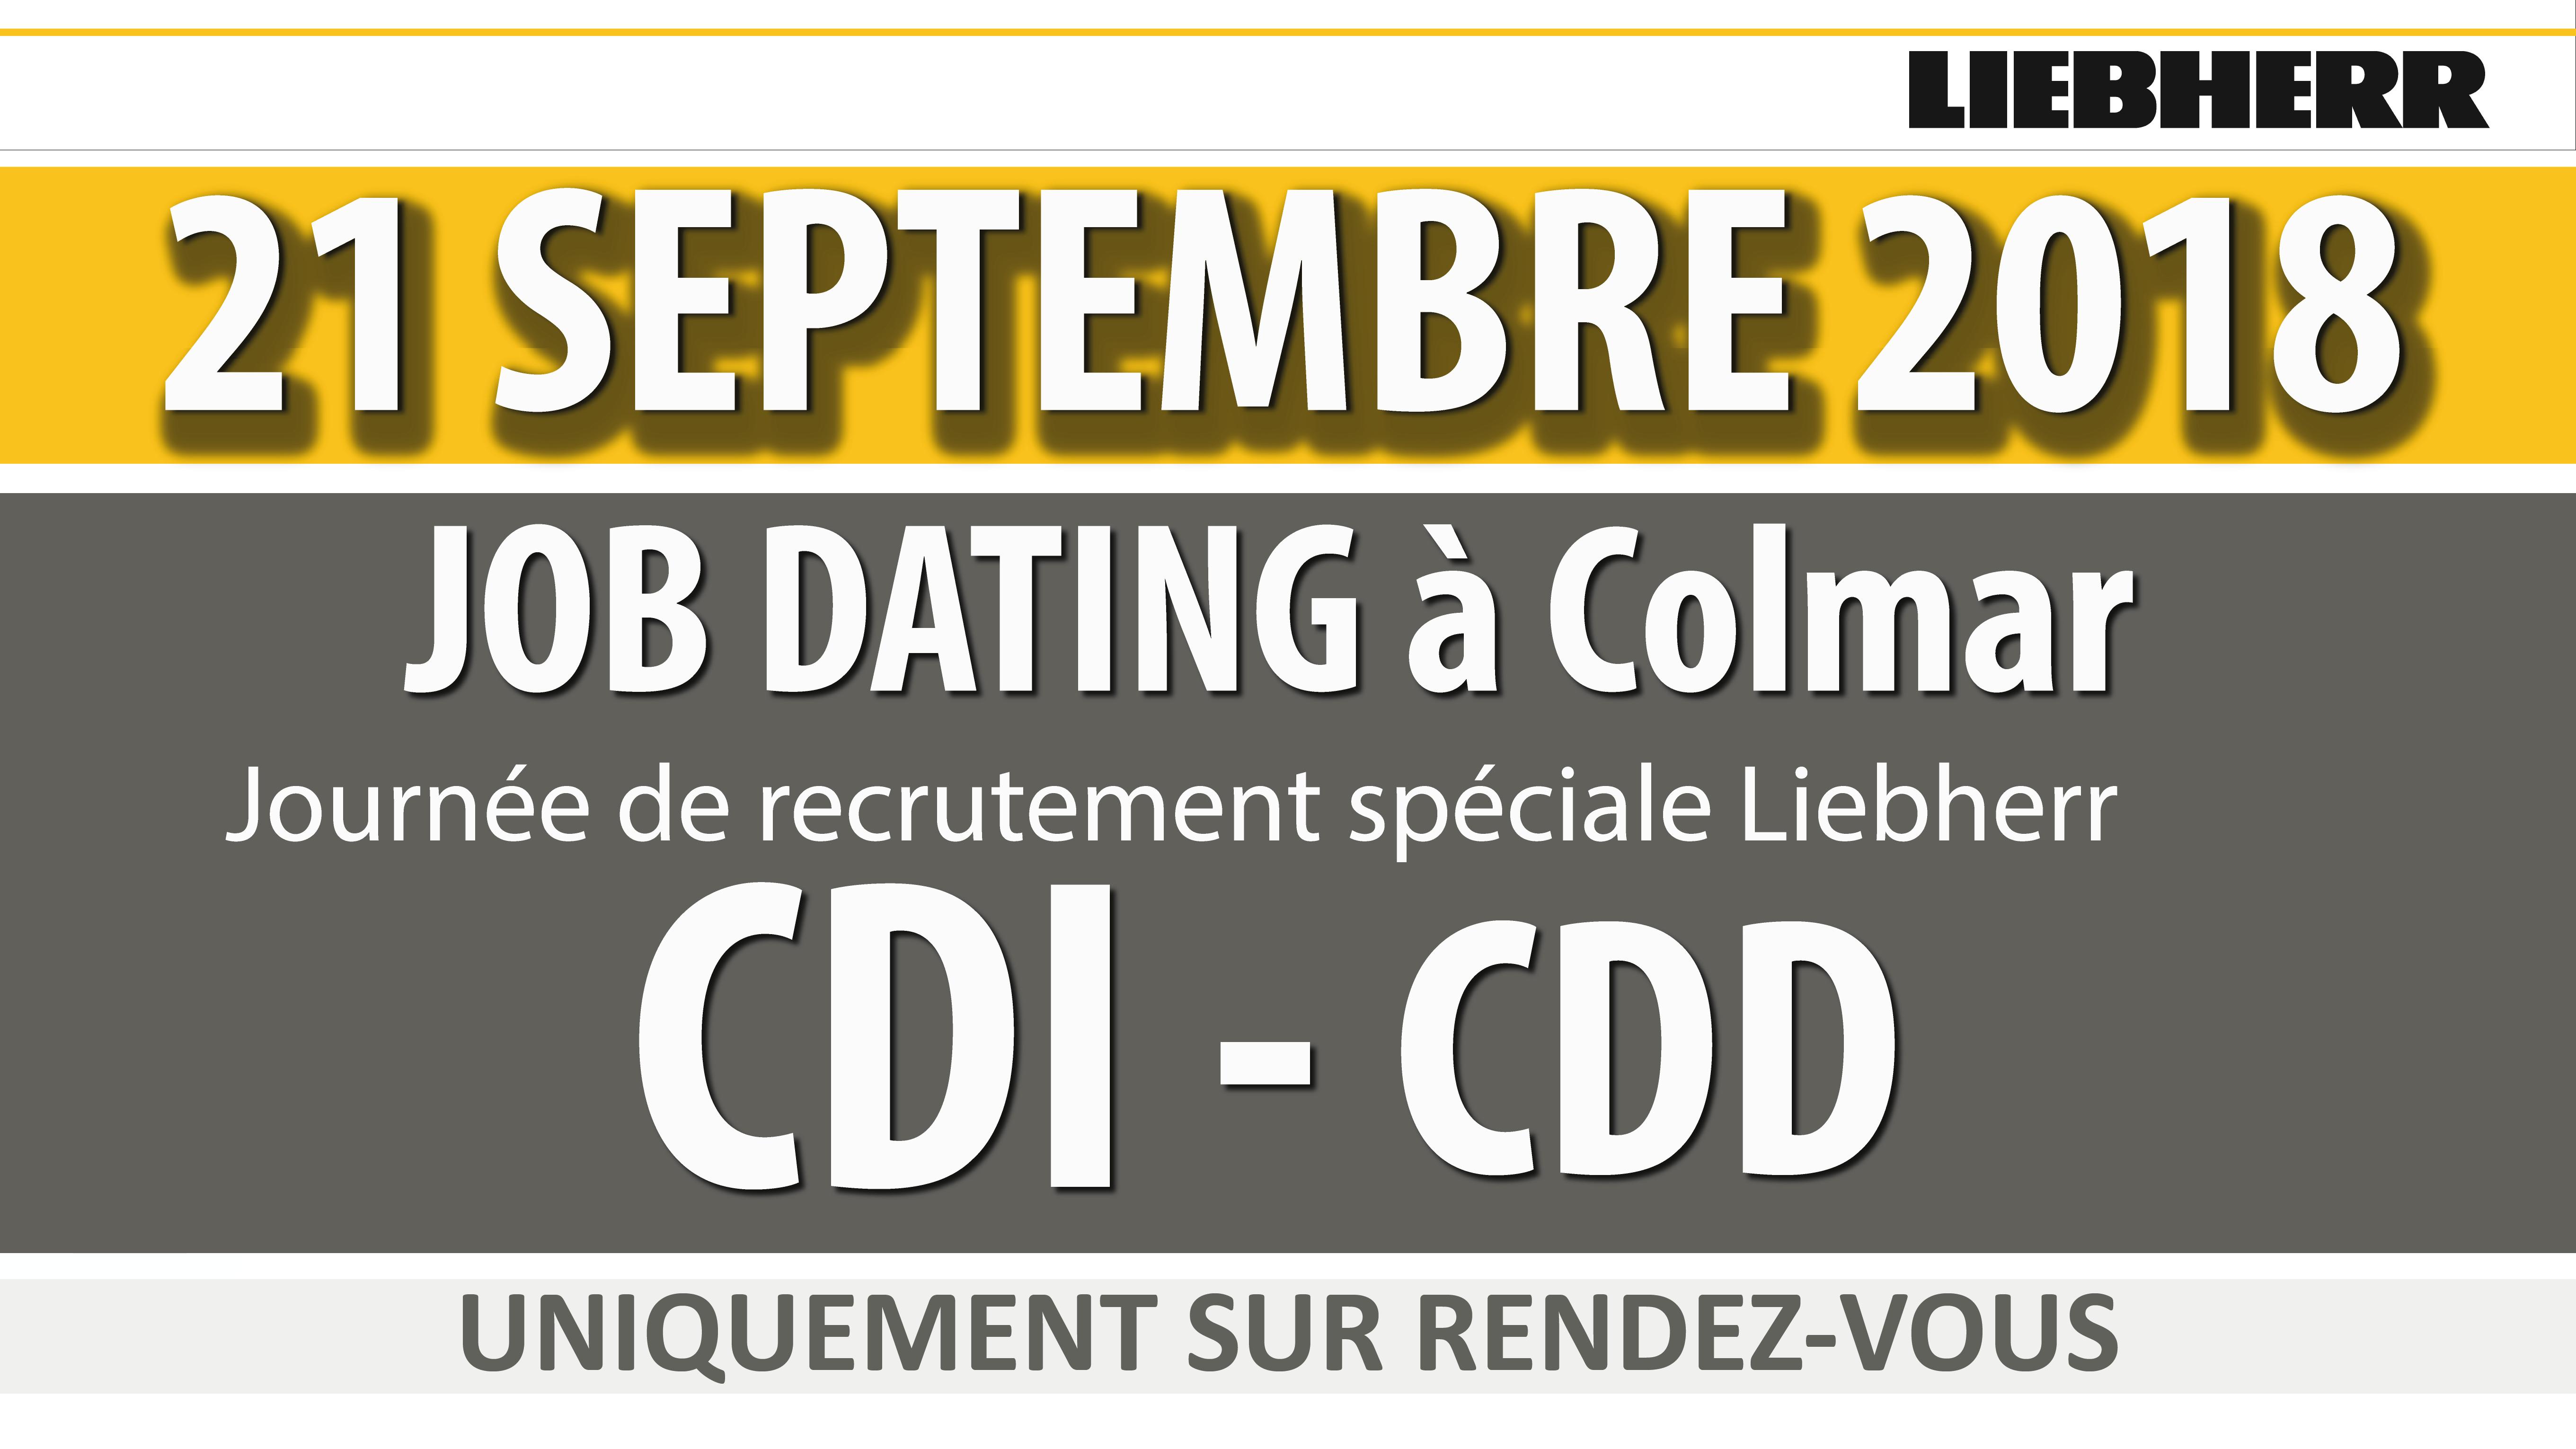 Job Dating LIEBHERR recrute Job Dating - LIEBHERR - 21 Septembre 2018 - COLMAR